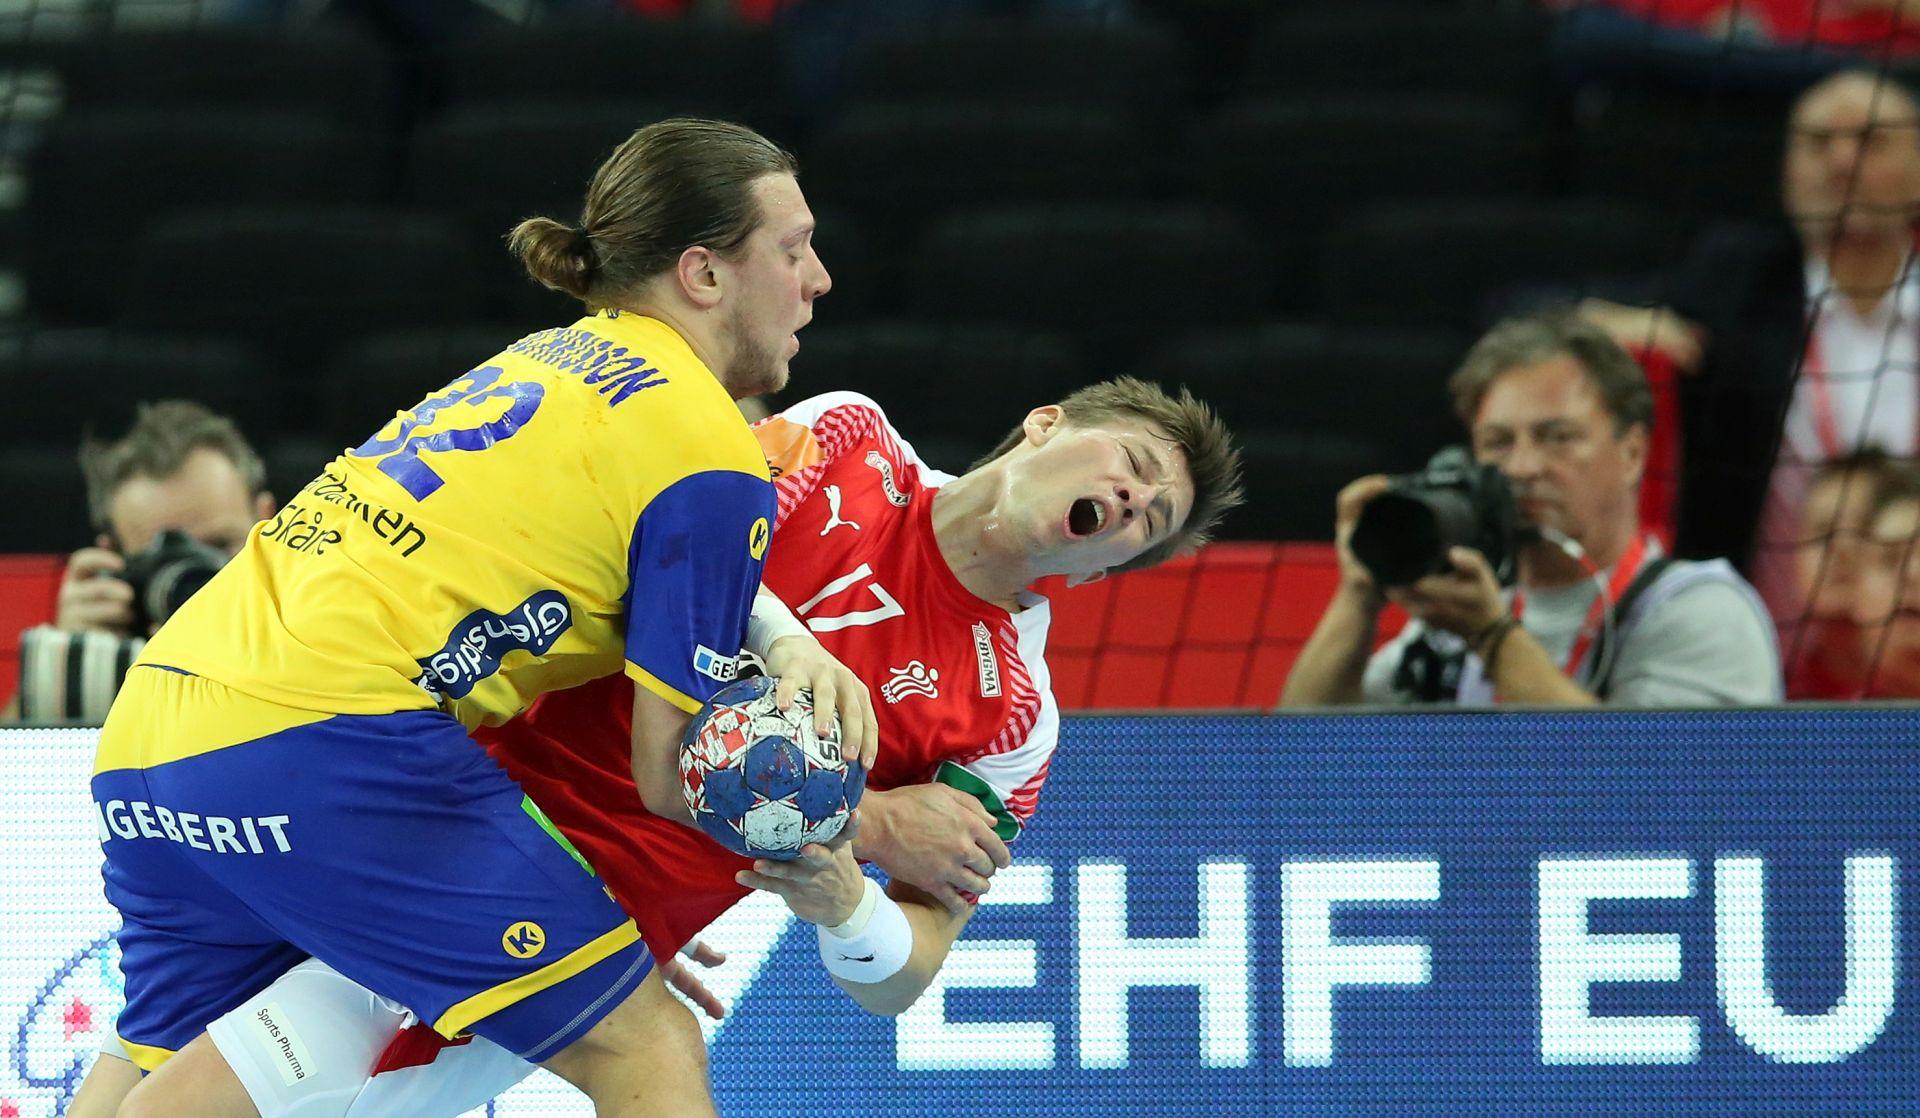 Nakon velike drame, finale Španjolska – Švedska